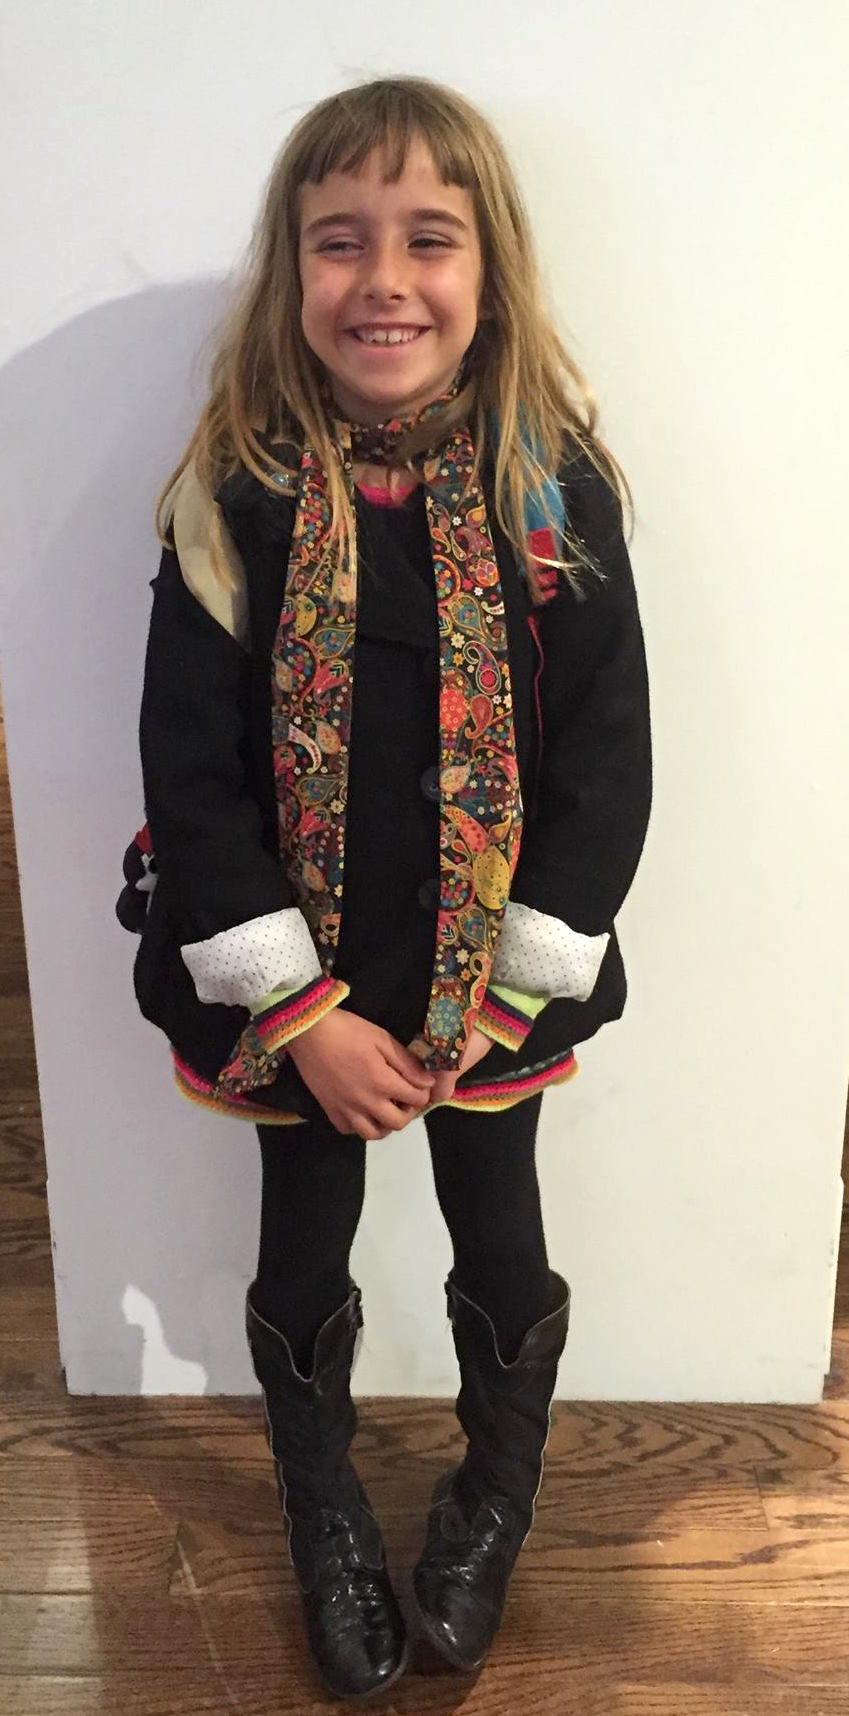 My stylish niece & her fab liberty scarf.